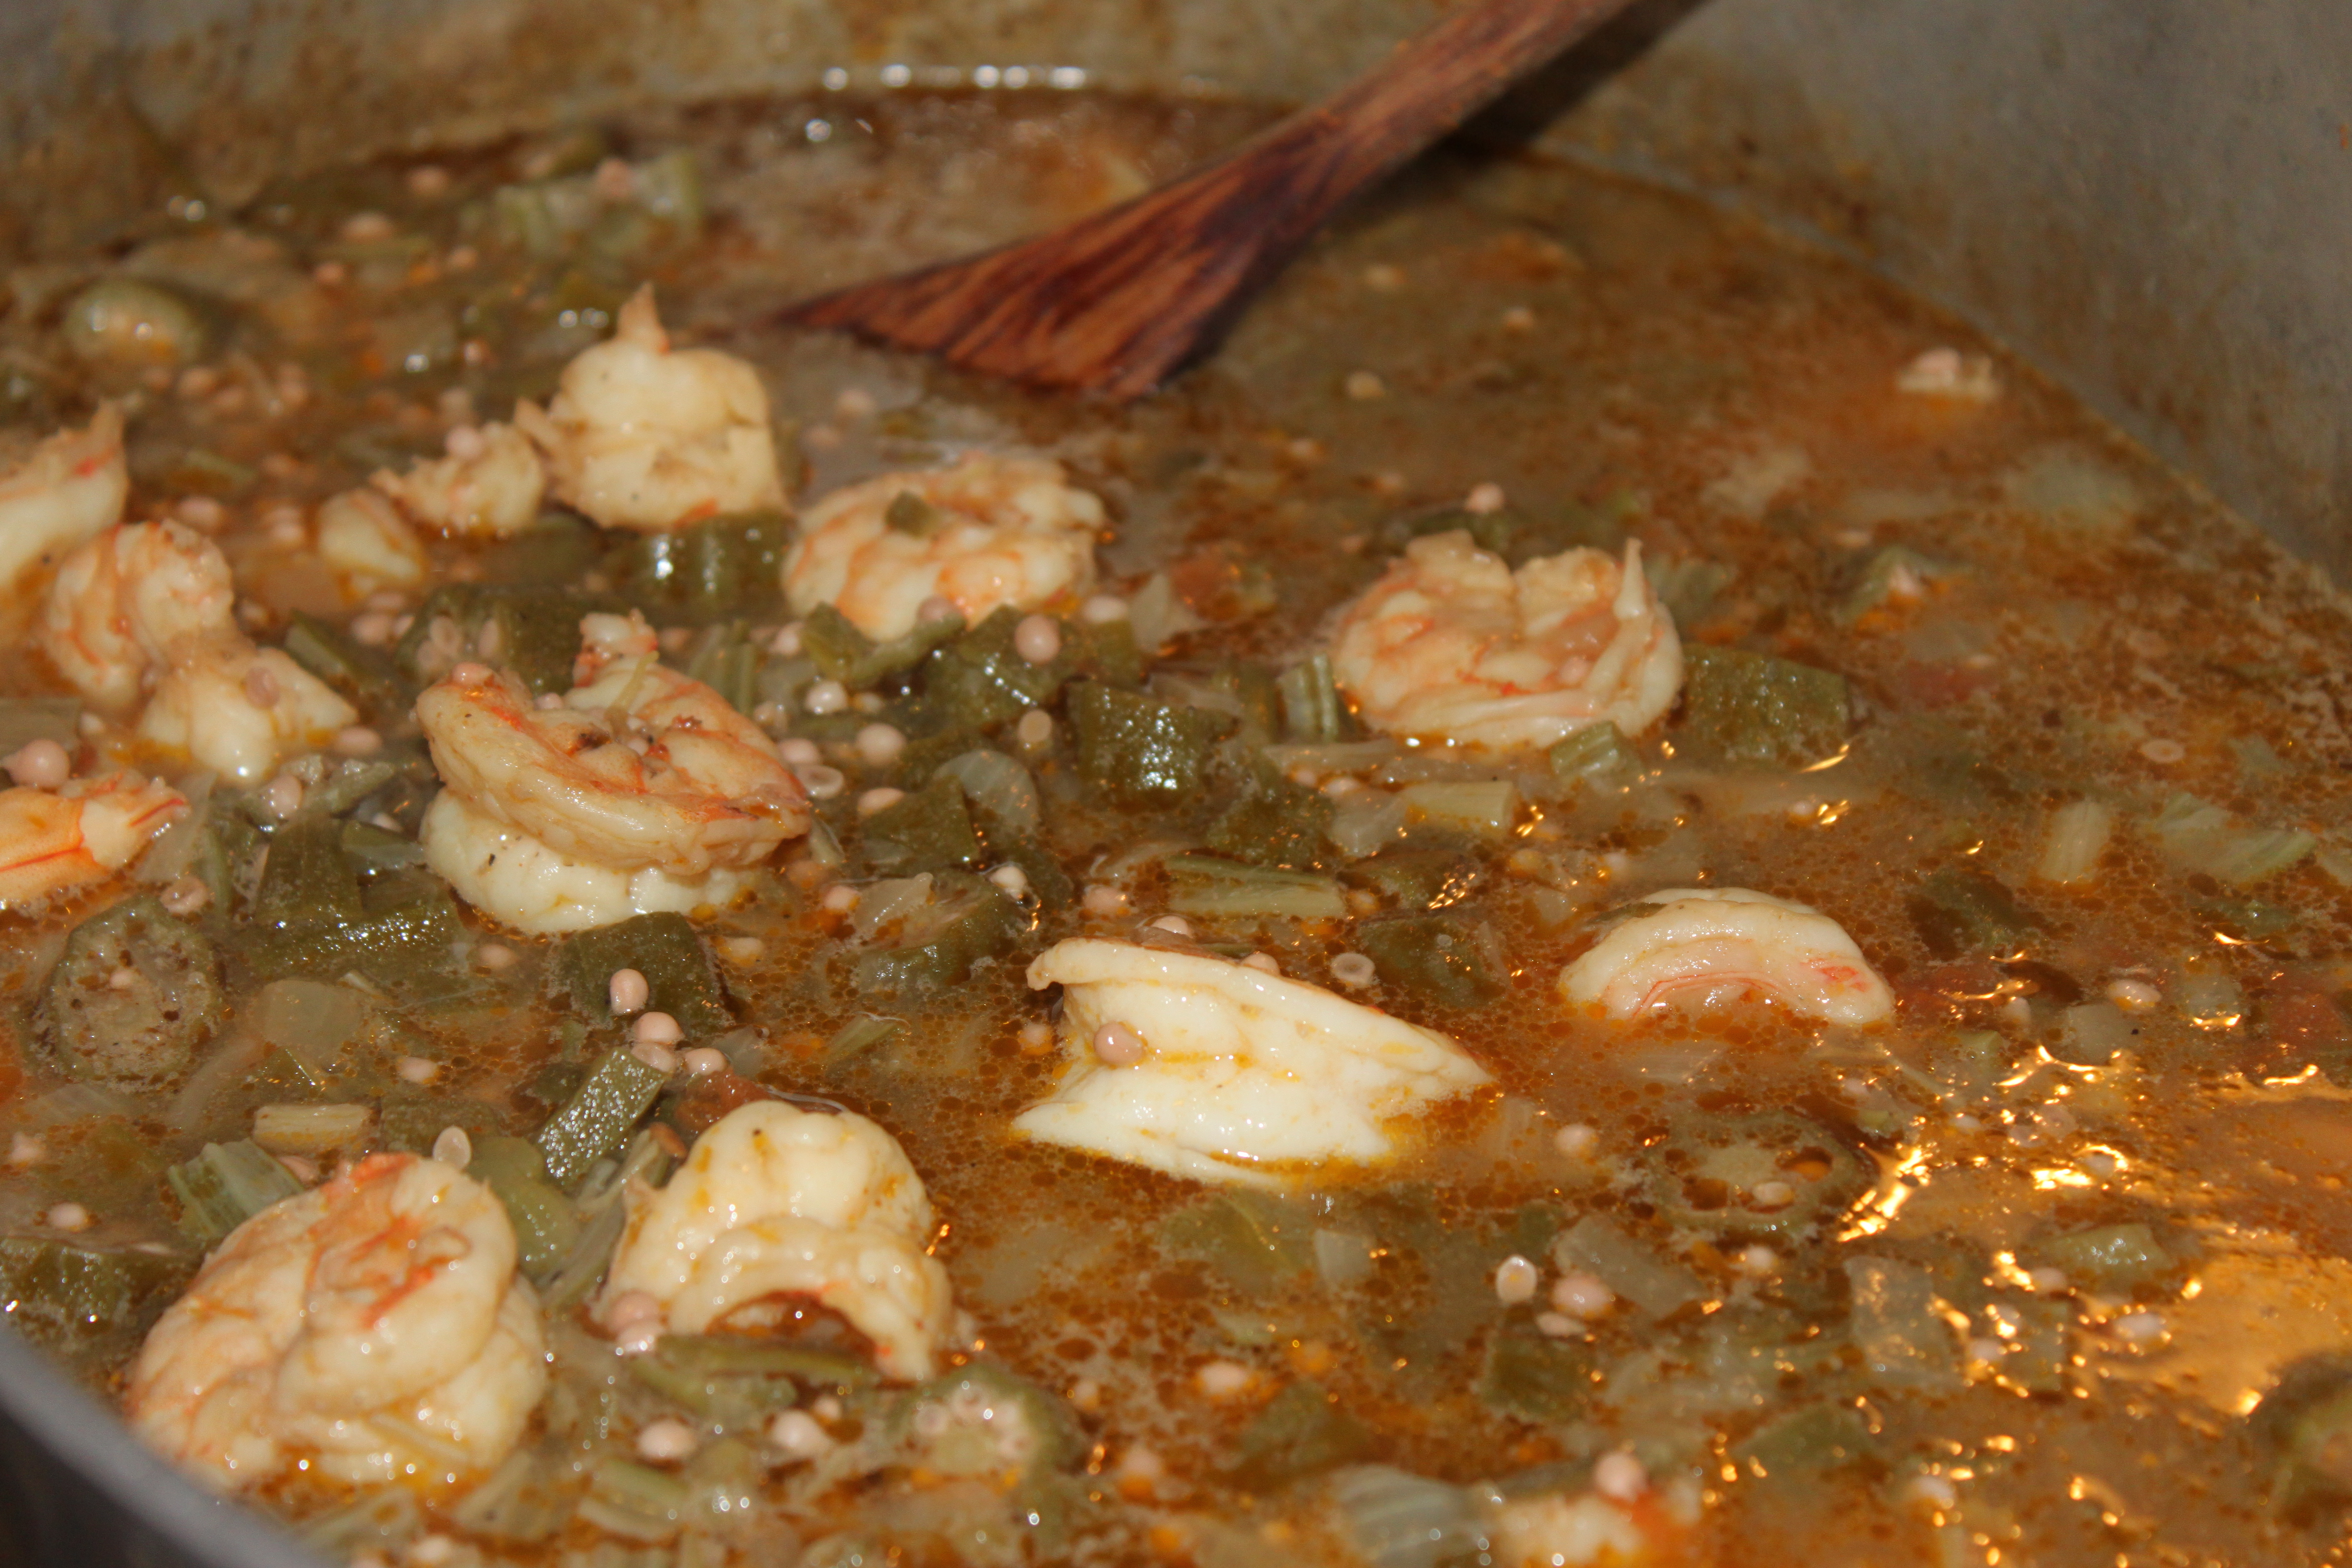 okra gumbo shrimp and okra gumbo shrimp and okra gumbo shrimp and okra ...